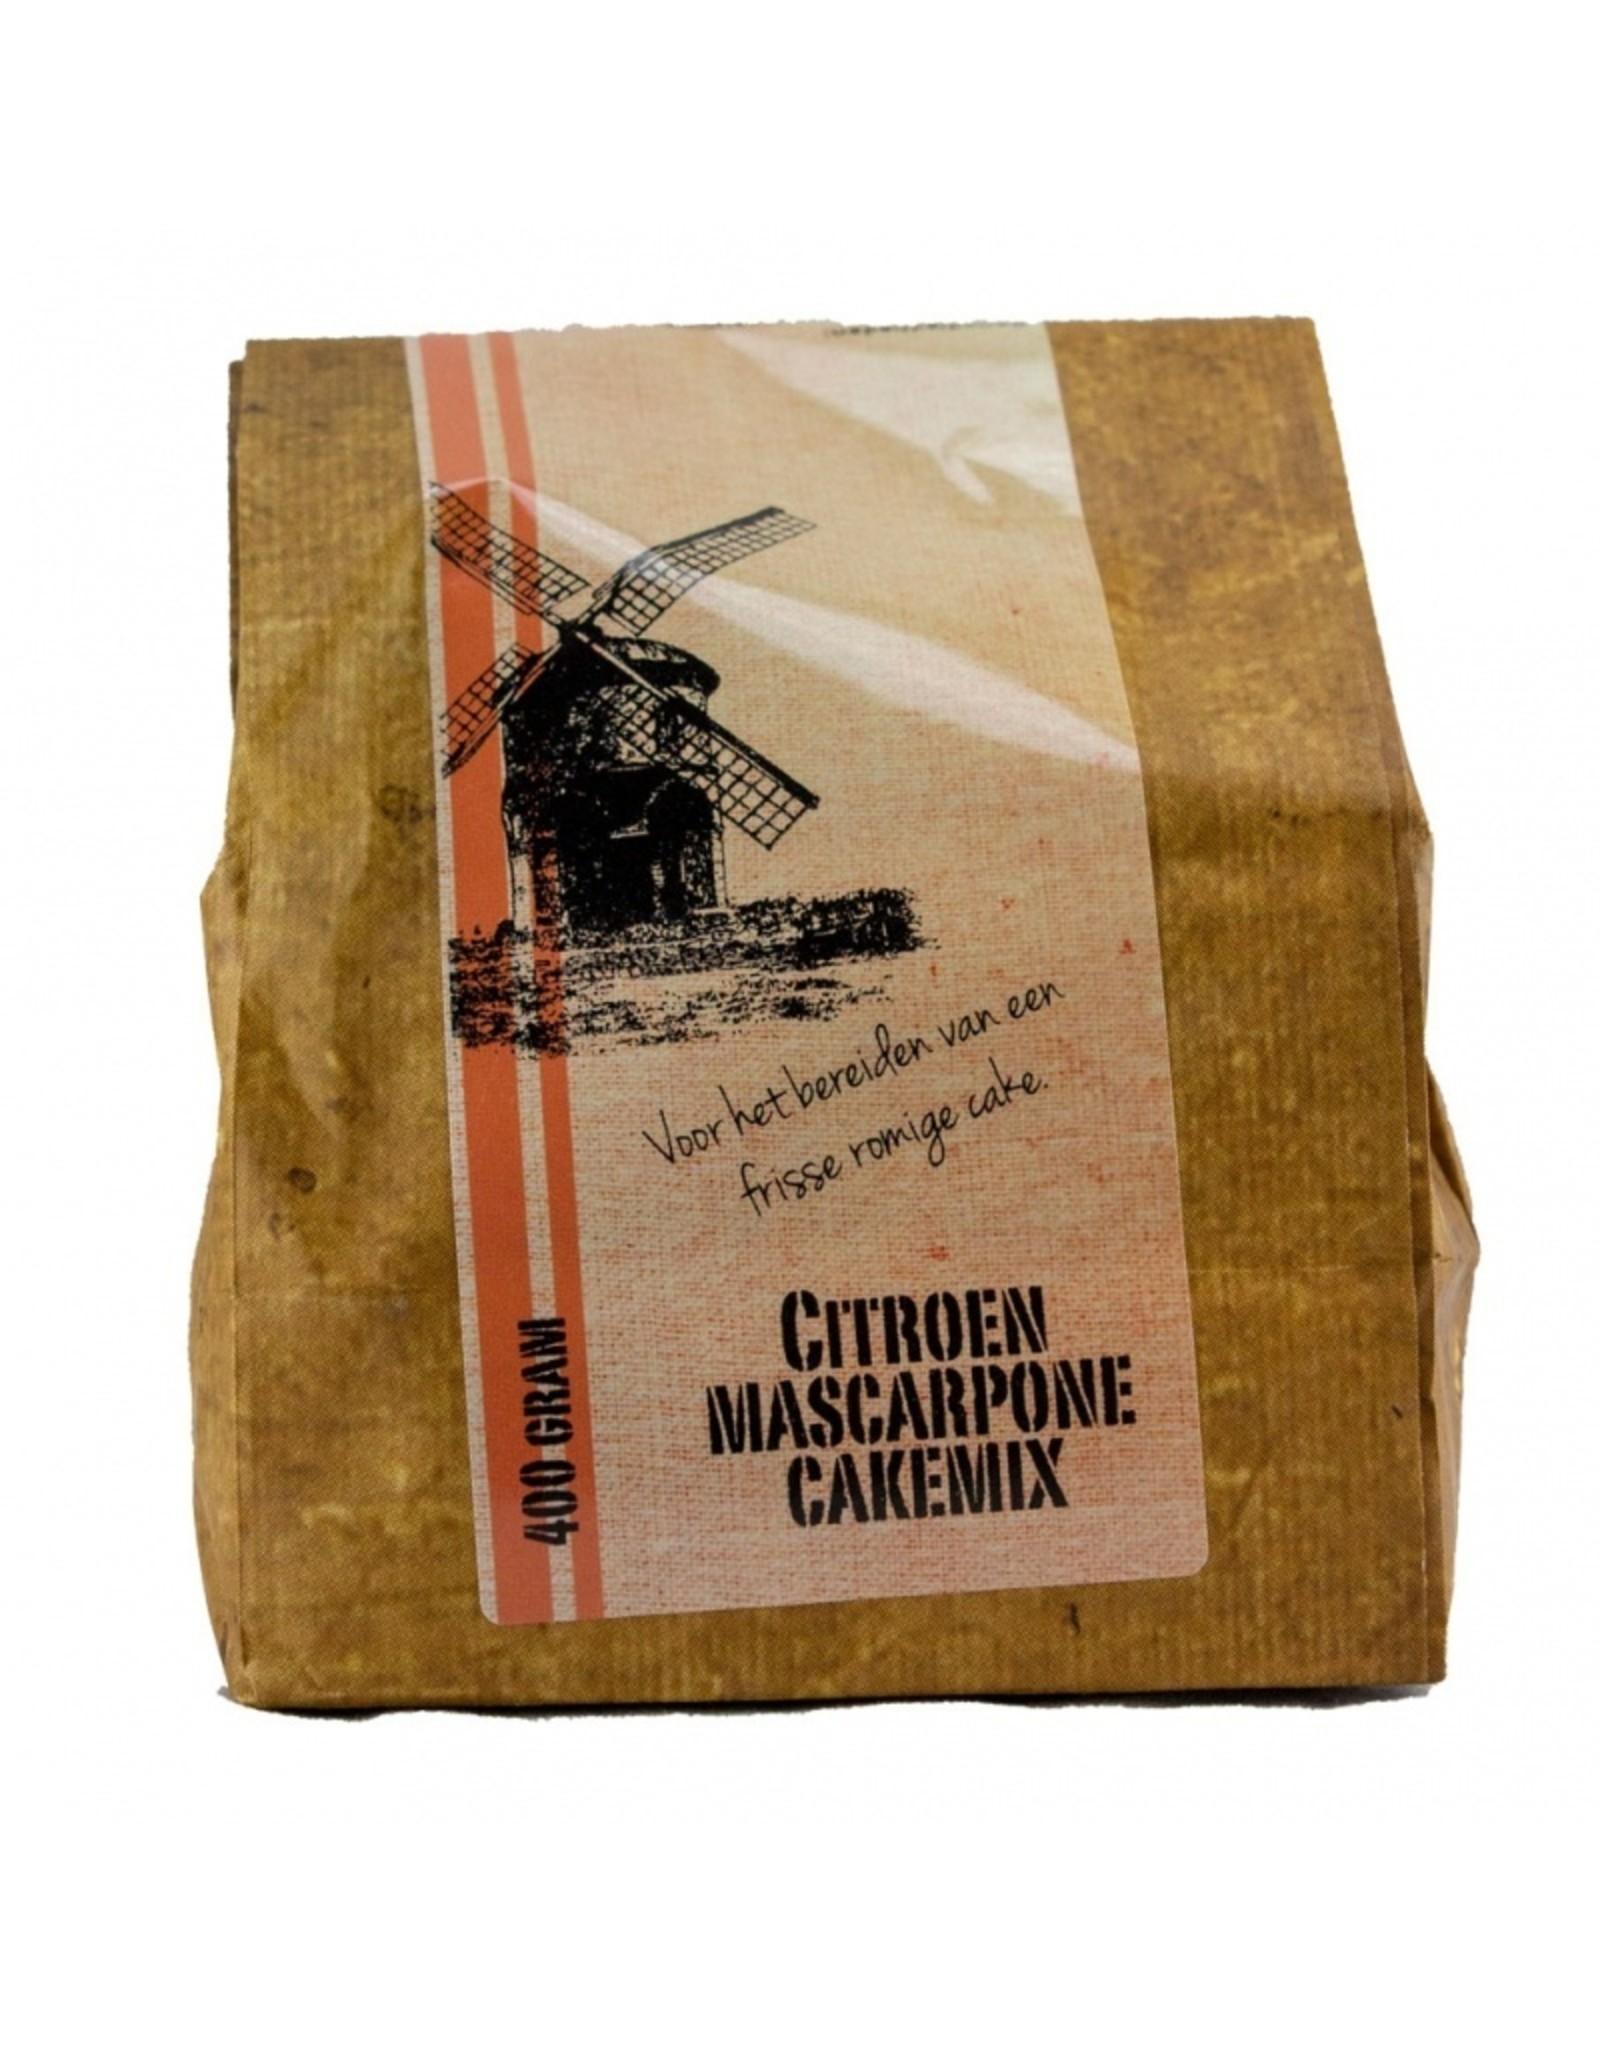 Landwinkel Citroen mascapone cake mix 0,4 kg